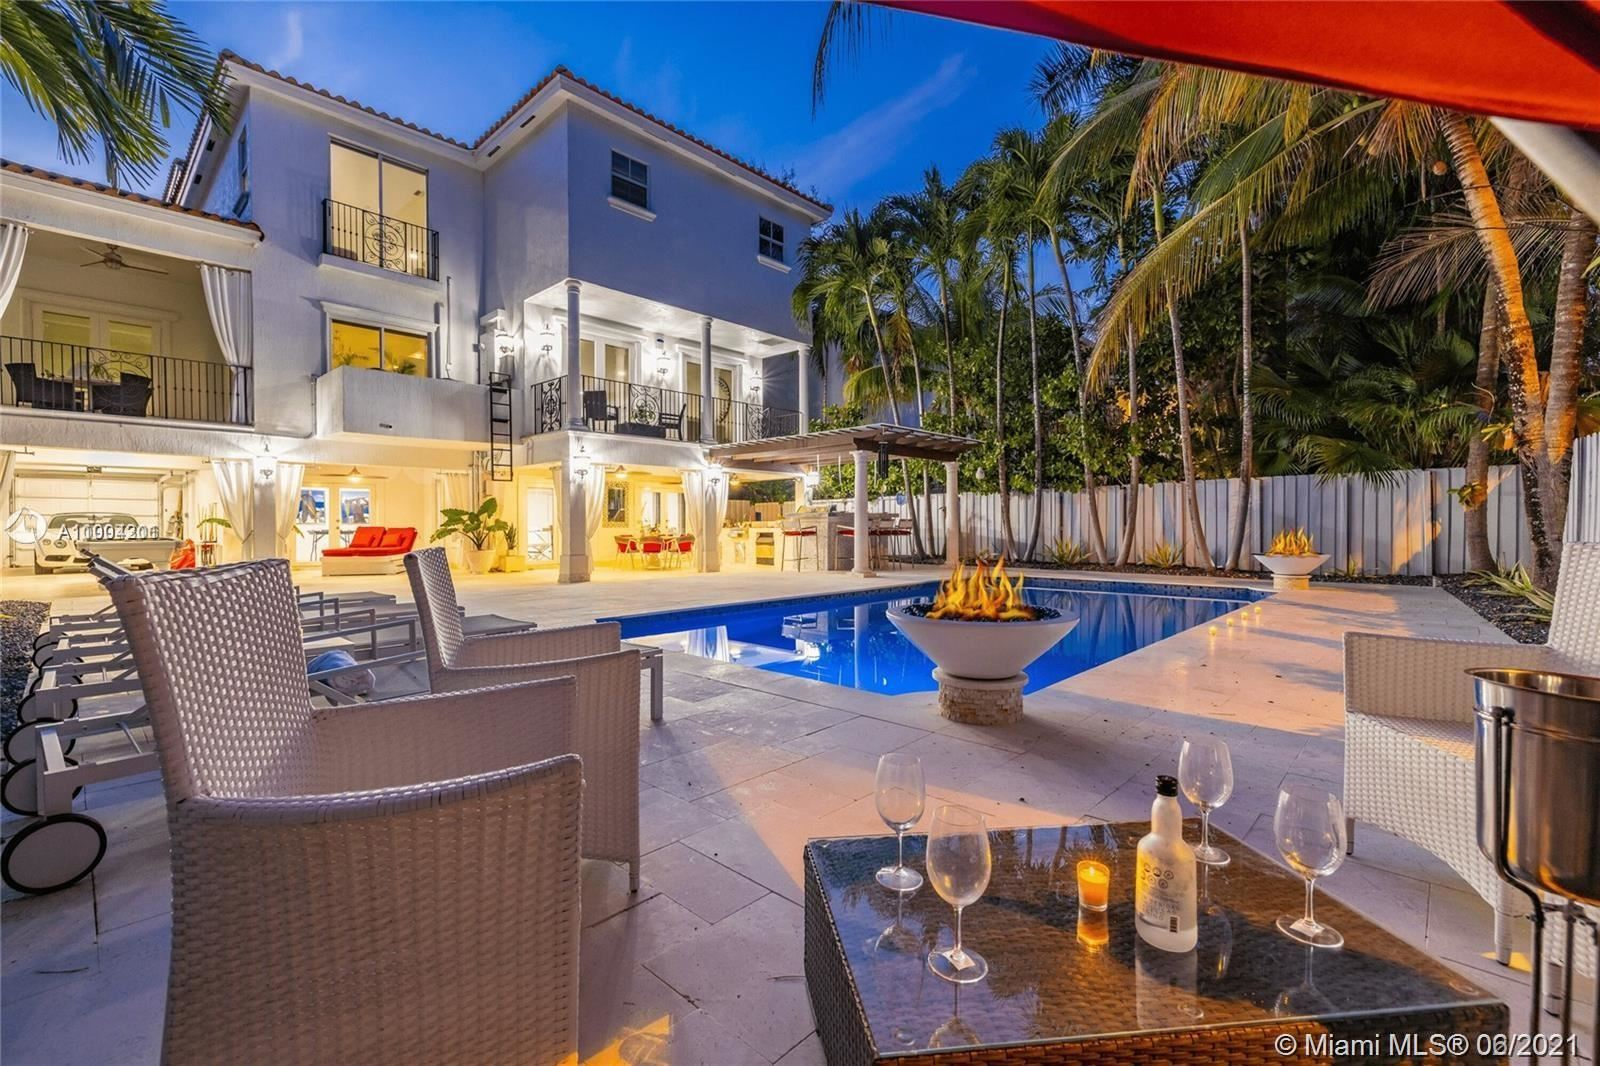 3535 E Fairview St, Miami, FL 33133 - #: A11004201